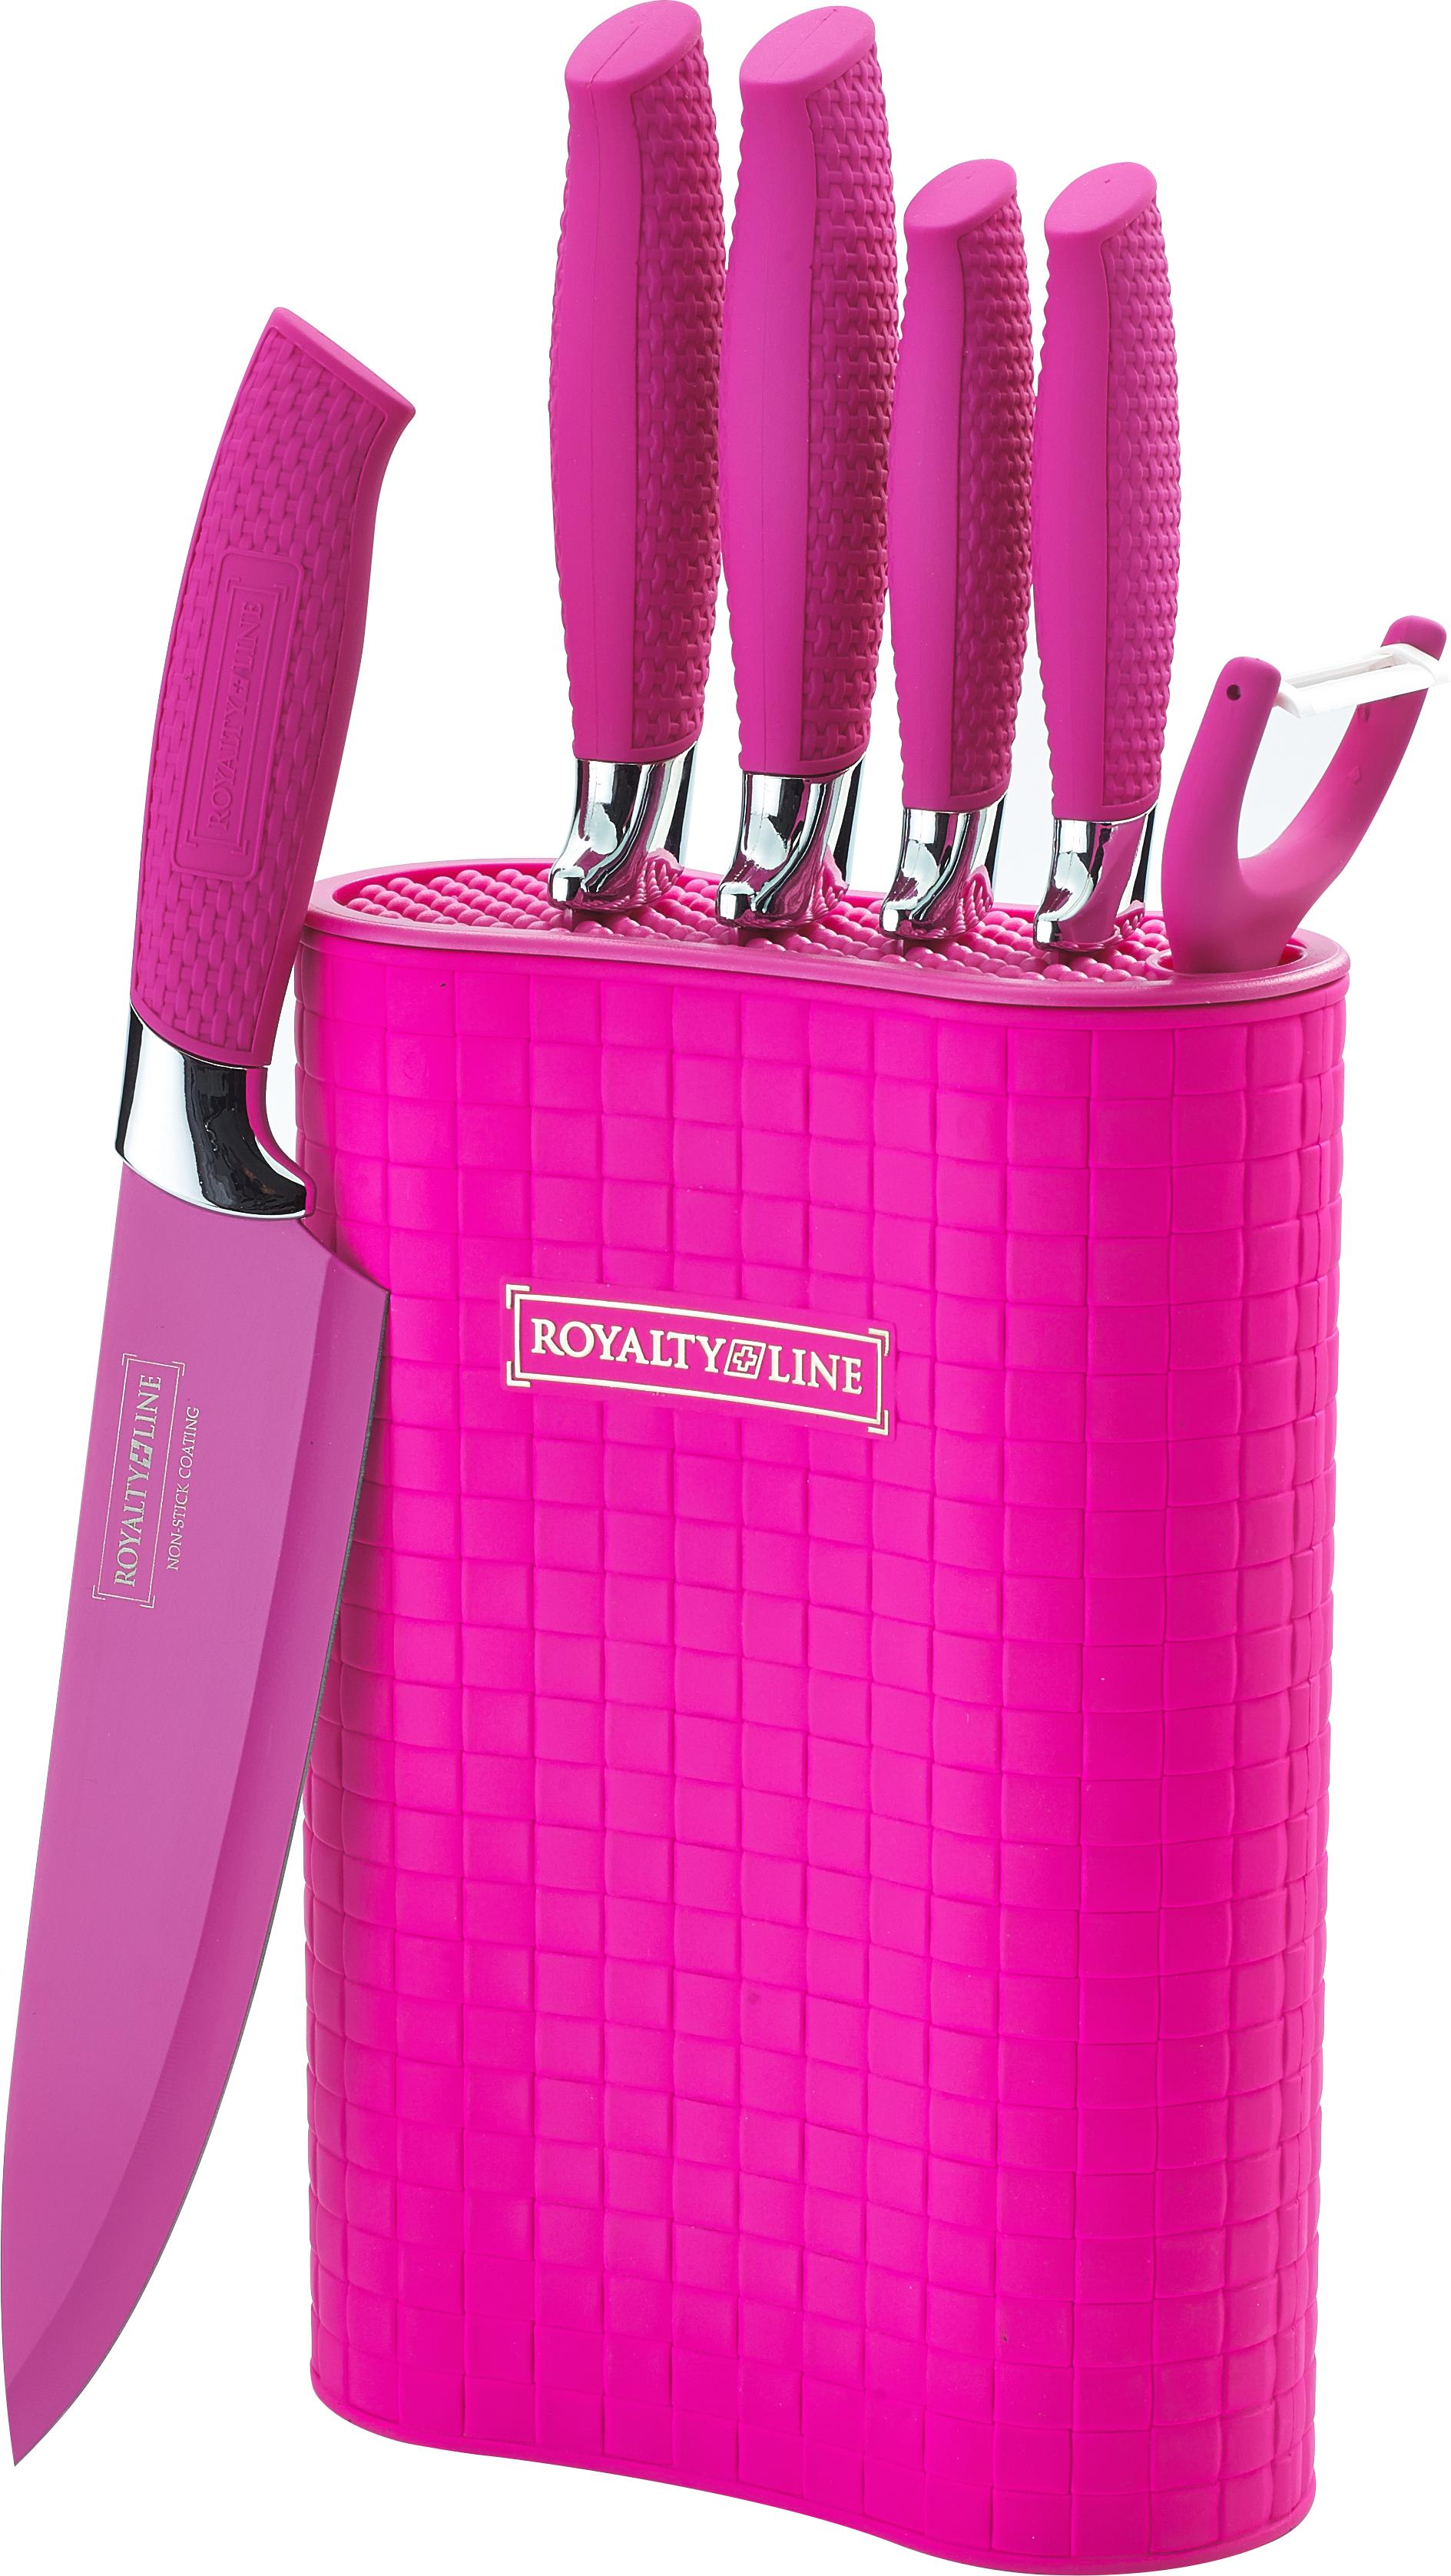 Royalty line rl 6mstk cuchillos con soporte 6pcs royalty - Como hacer soporte para cuchillos ...